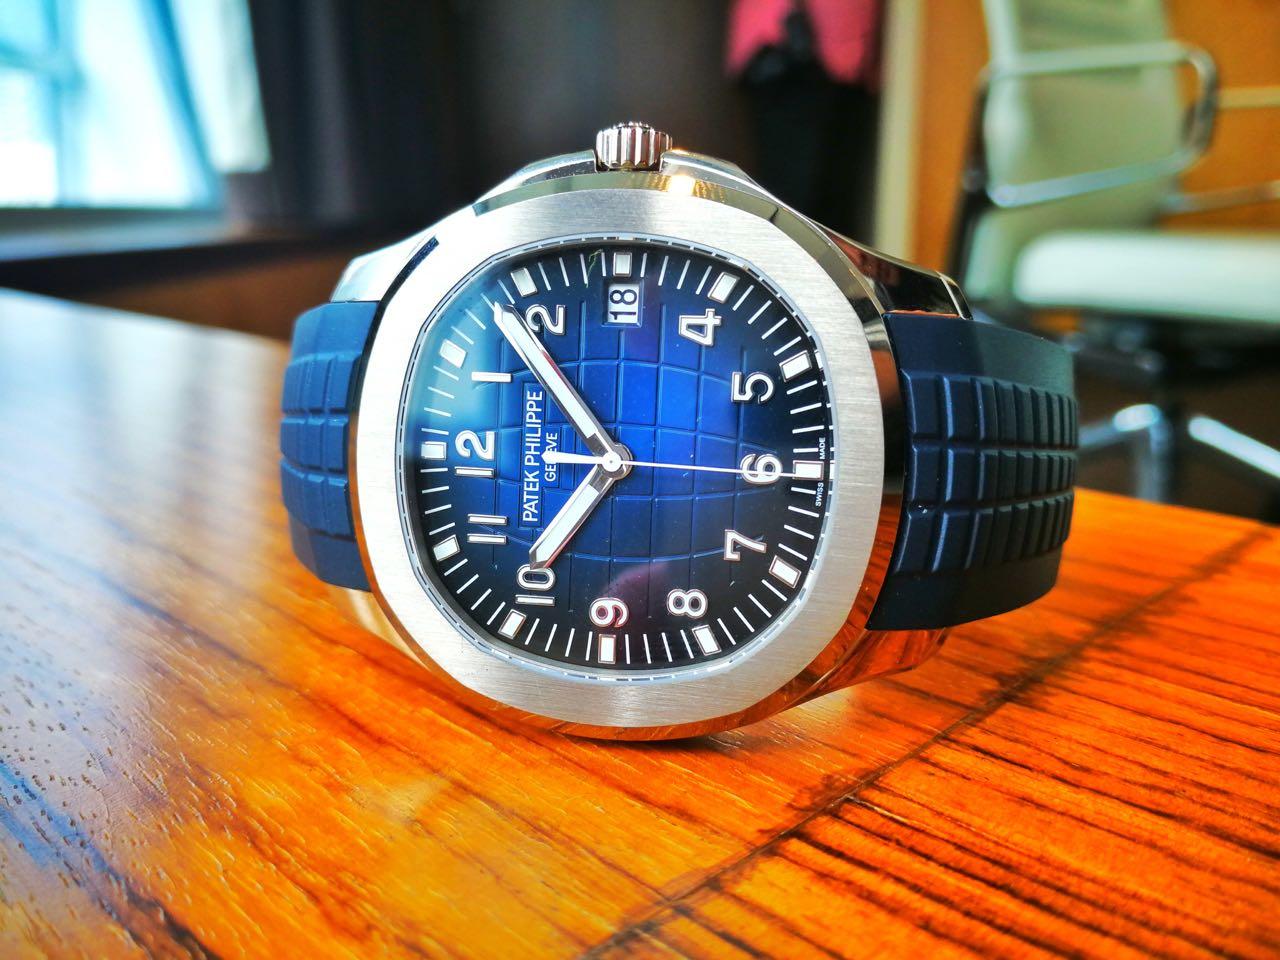 Patek Philippe Celebrates The 20th Anniversary Of The Aquanaut